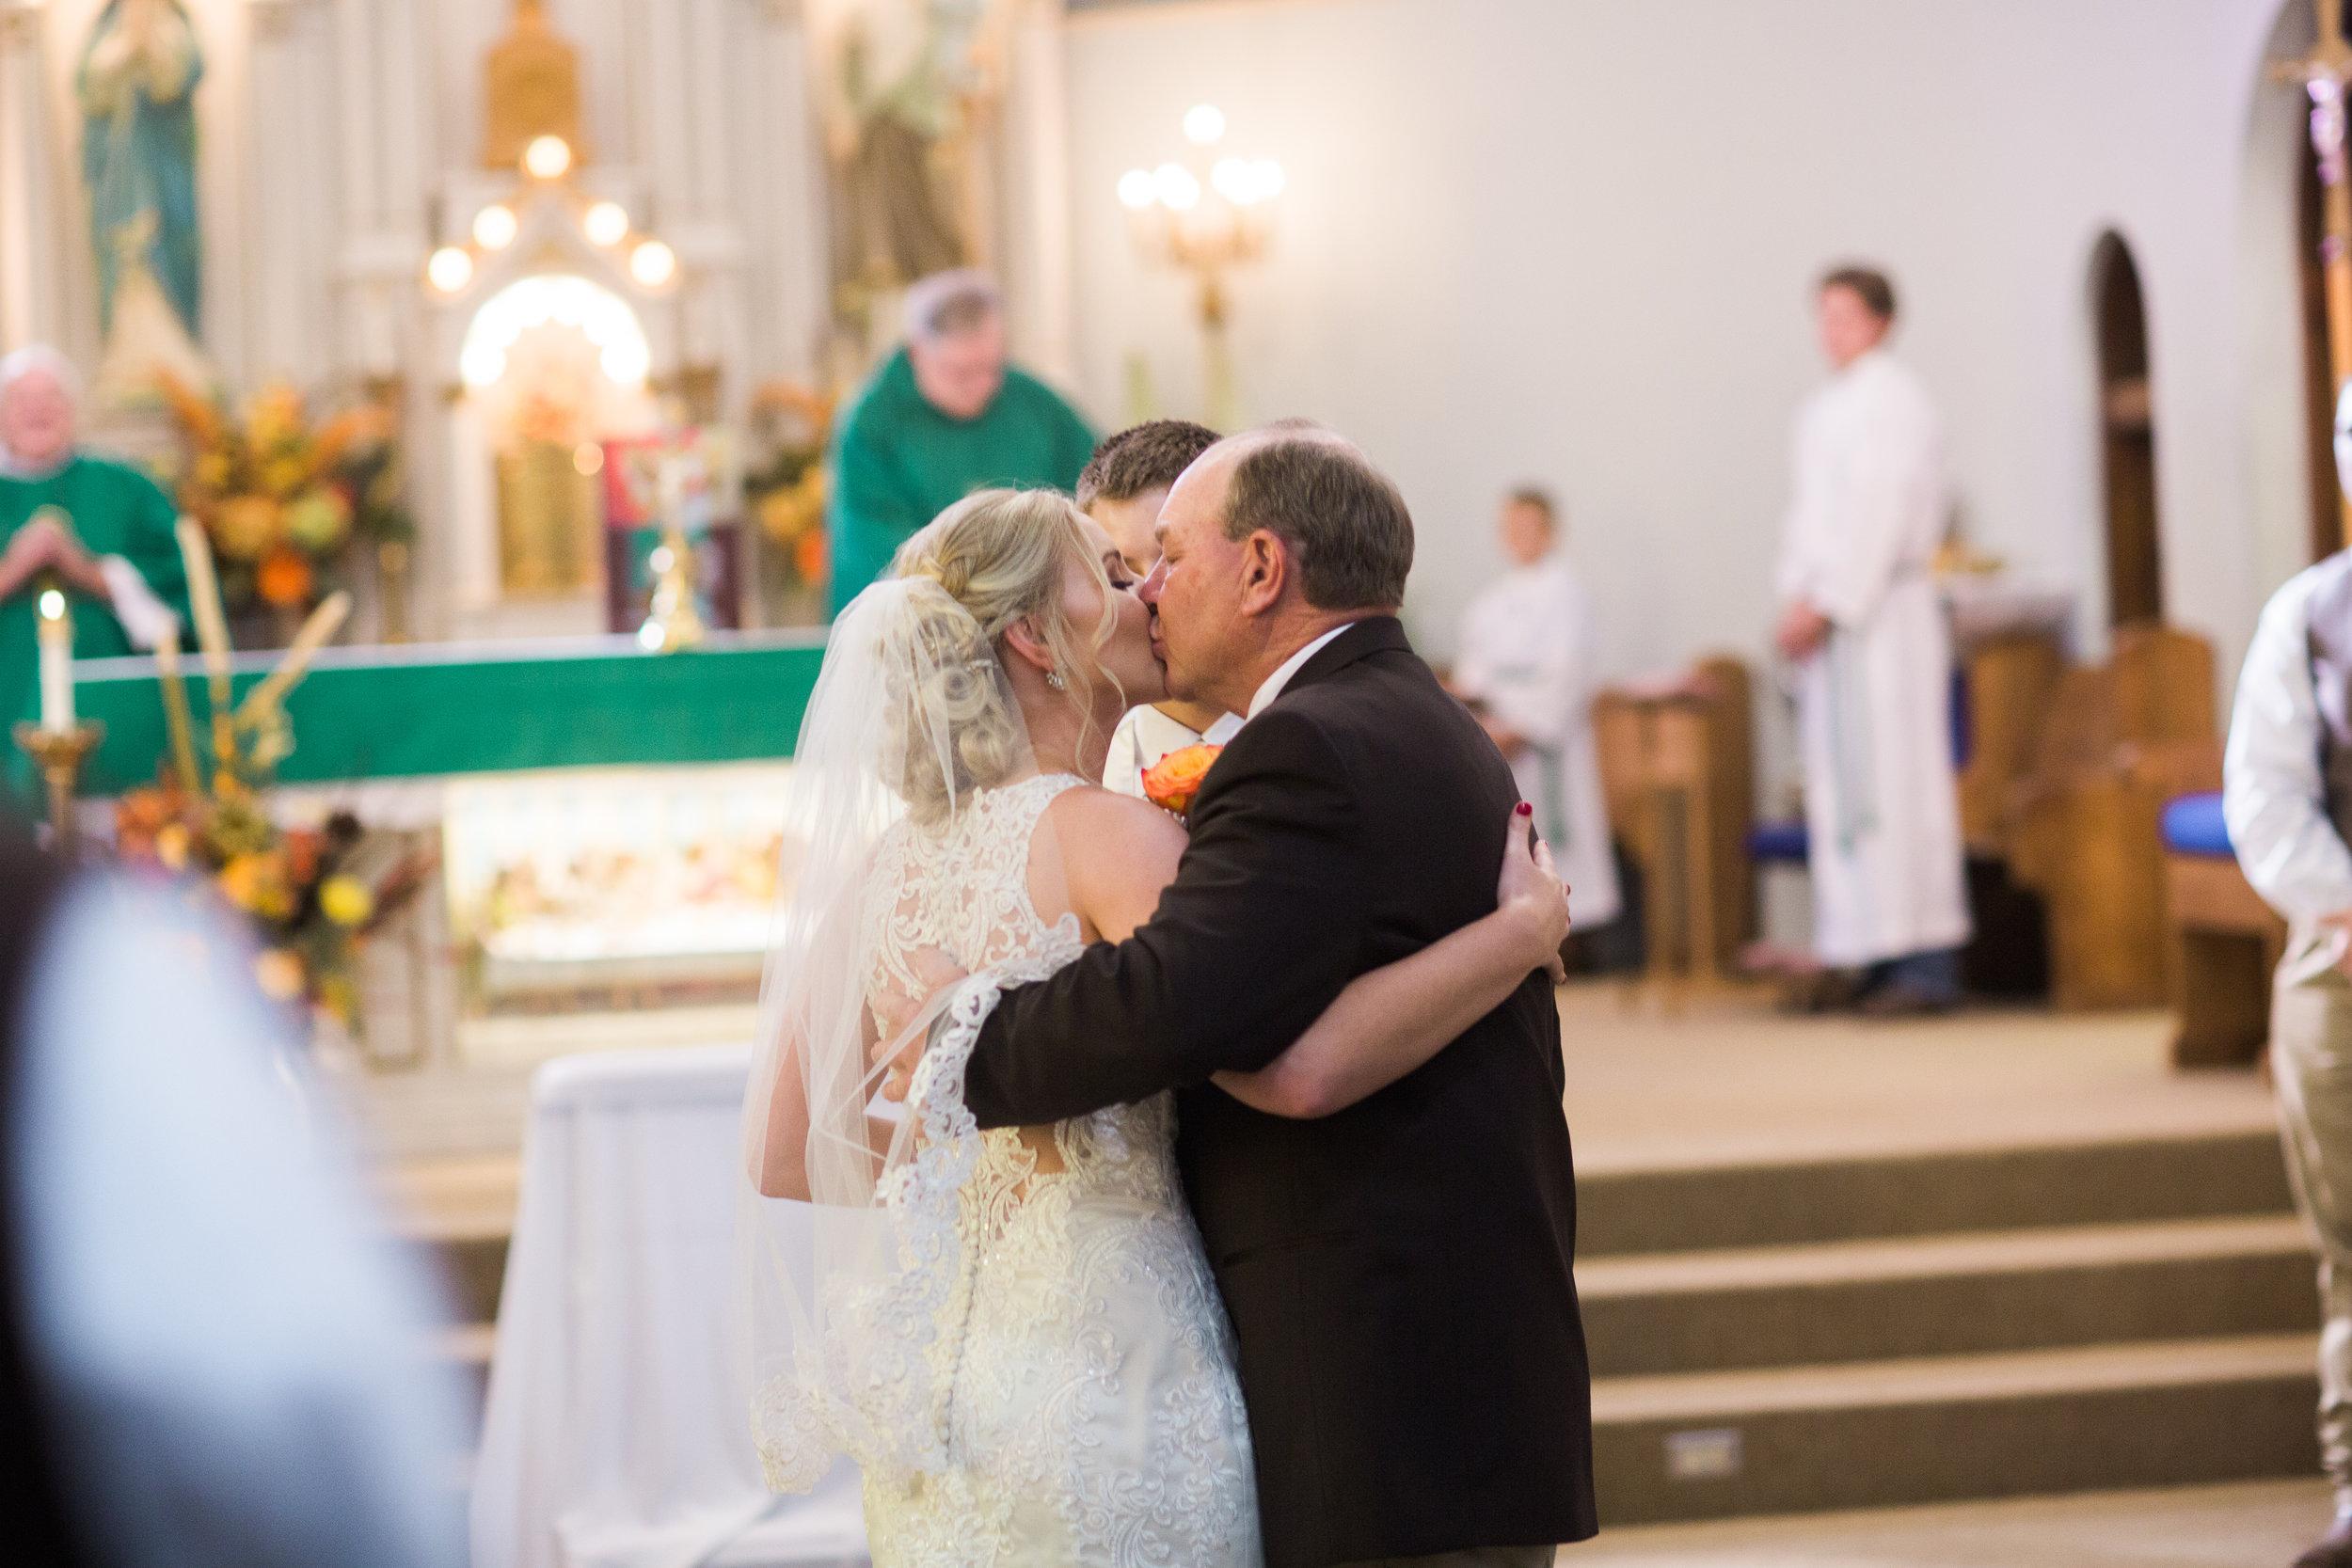 Bailey-Nathan-Windthorst-Texas-Wedding-036.jpg